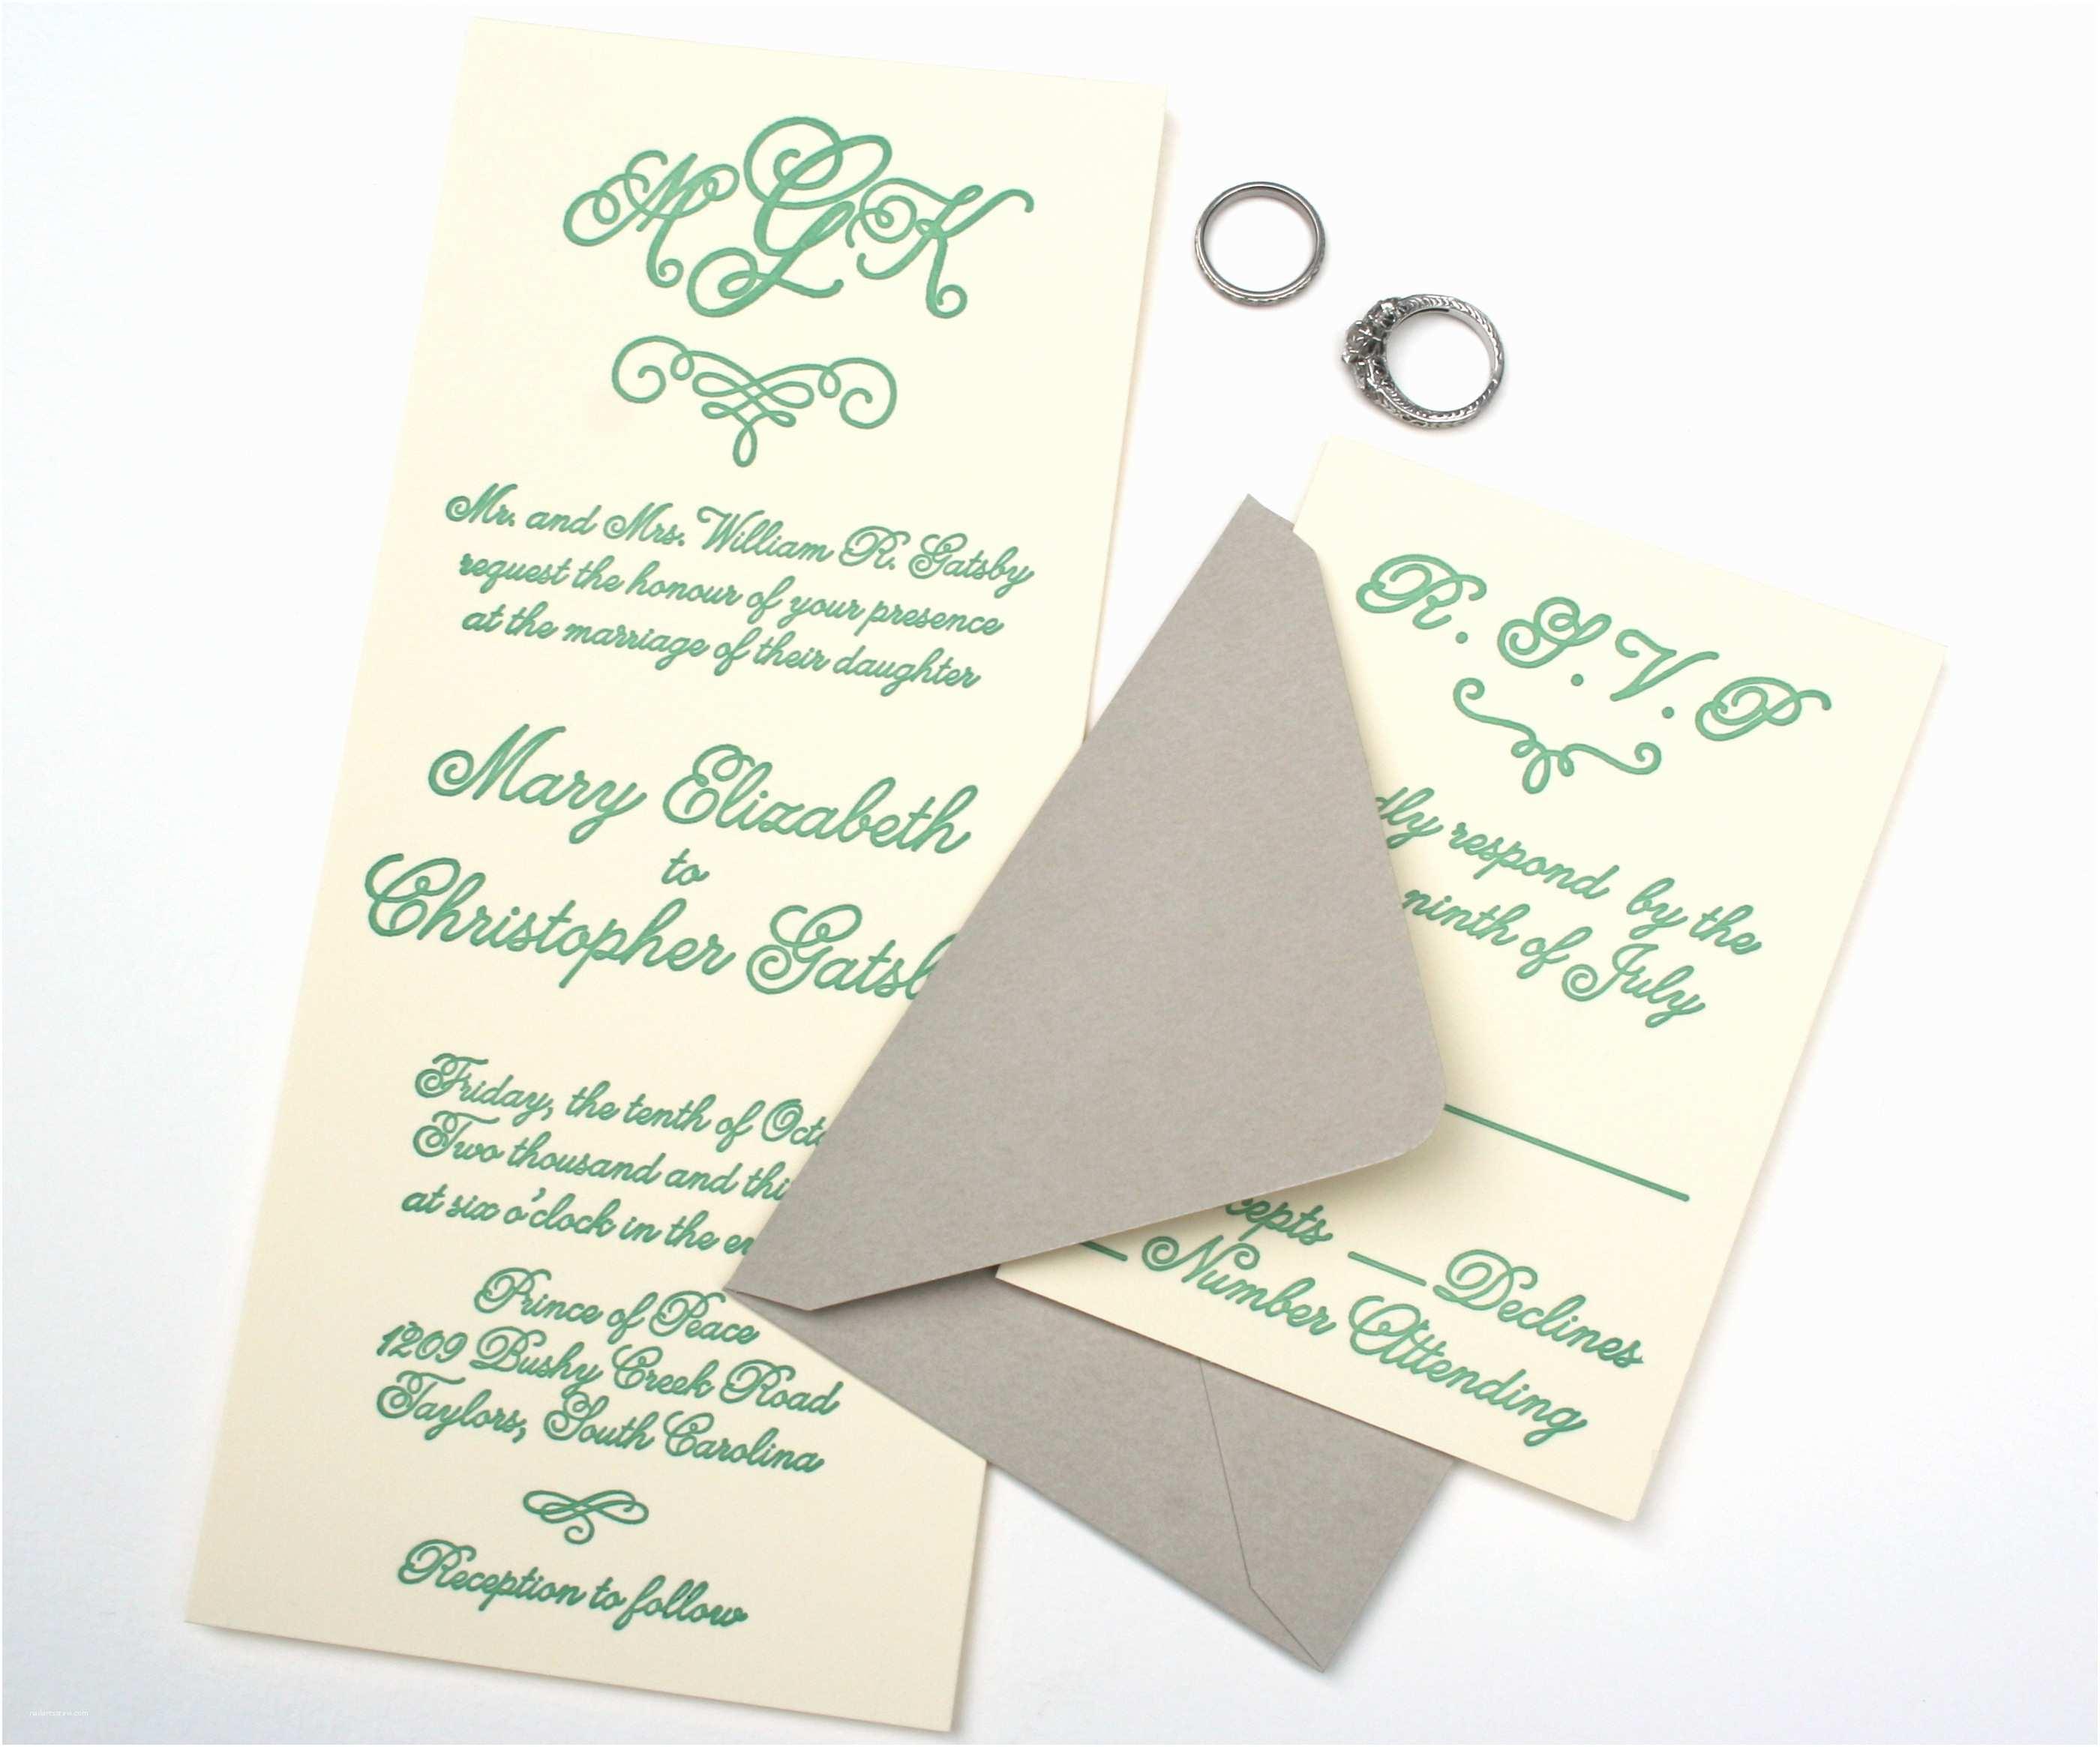 Emerald Green Wedding Invitations Emerald Green Letterpress Wedding Invitation with Monogram